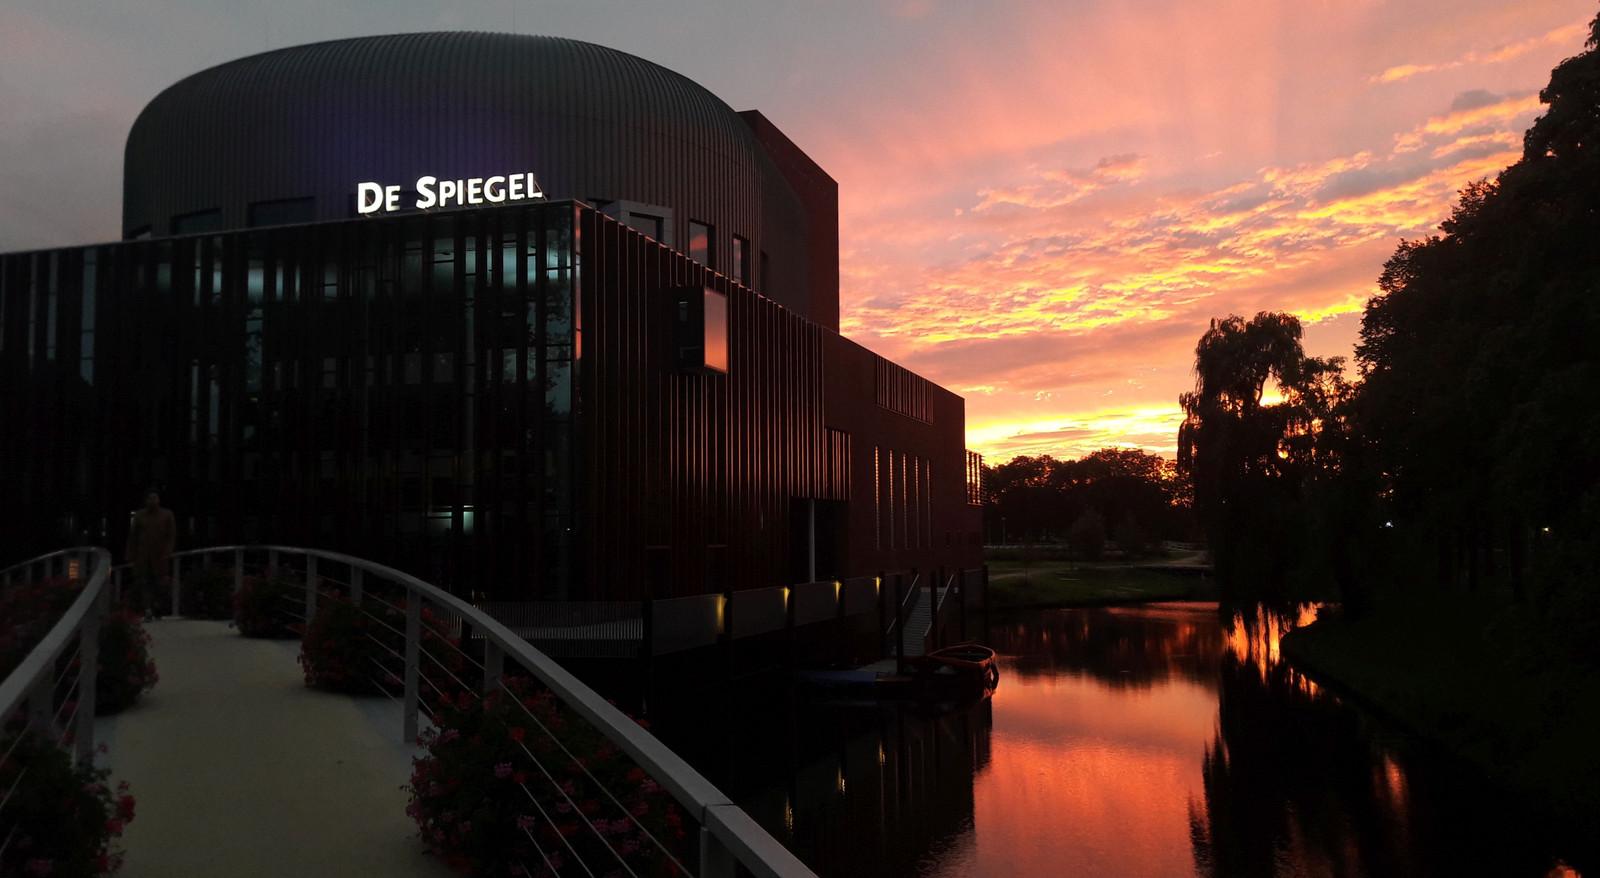 Uitzicht op theater De Spiegel in Zwolle, even na acht uur vanavond.